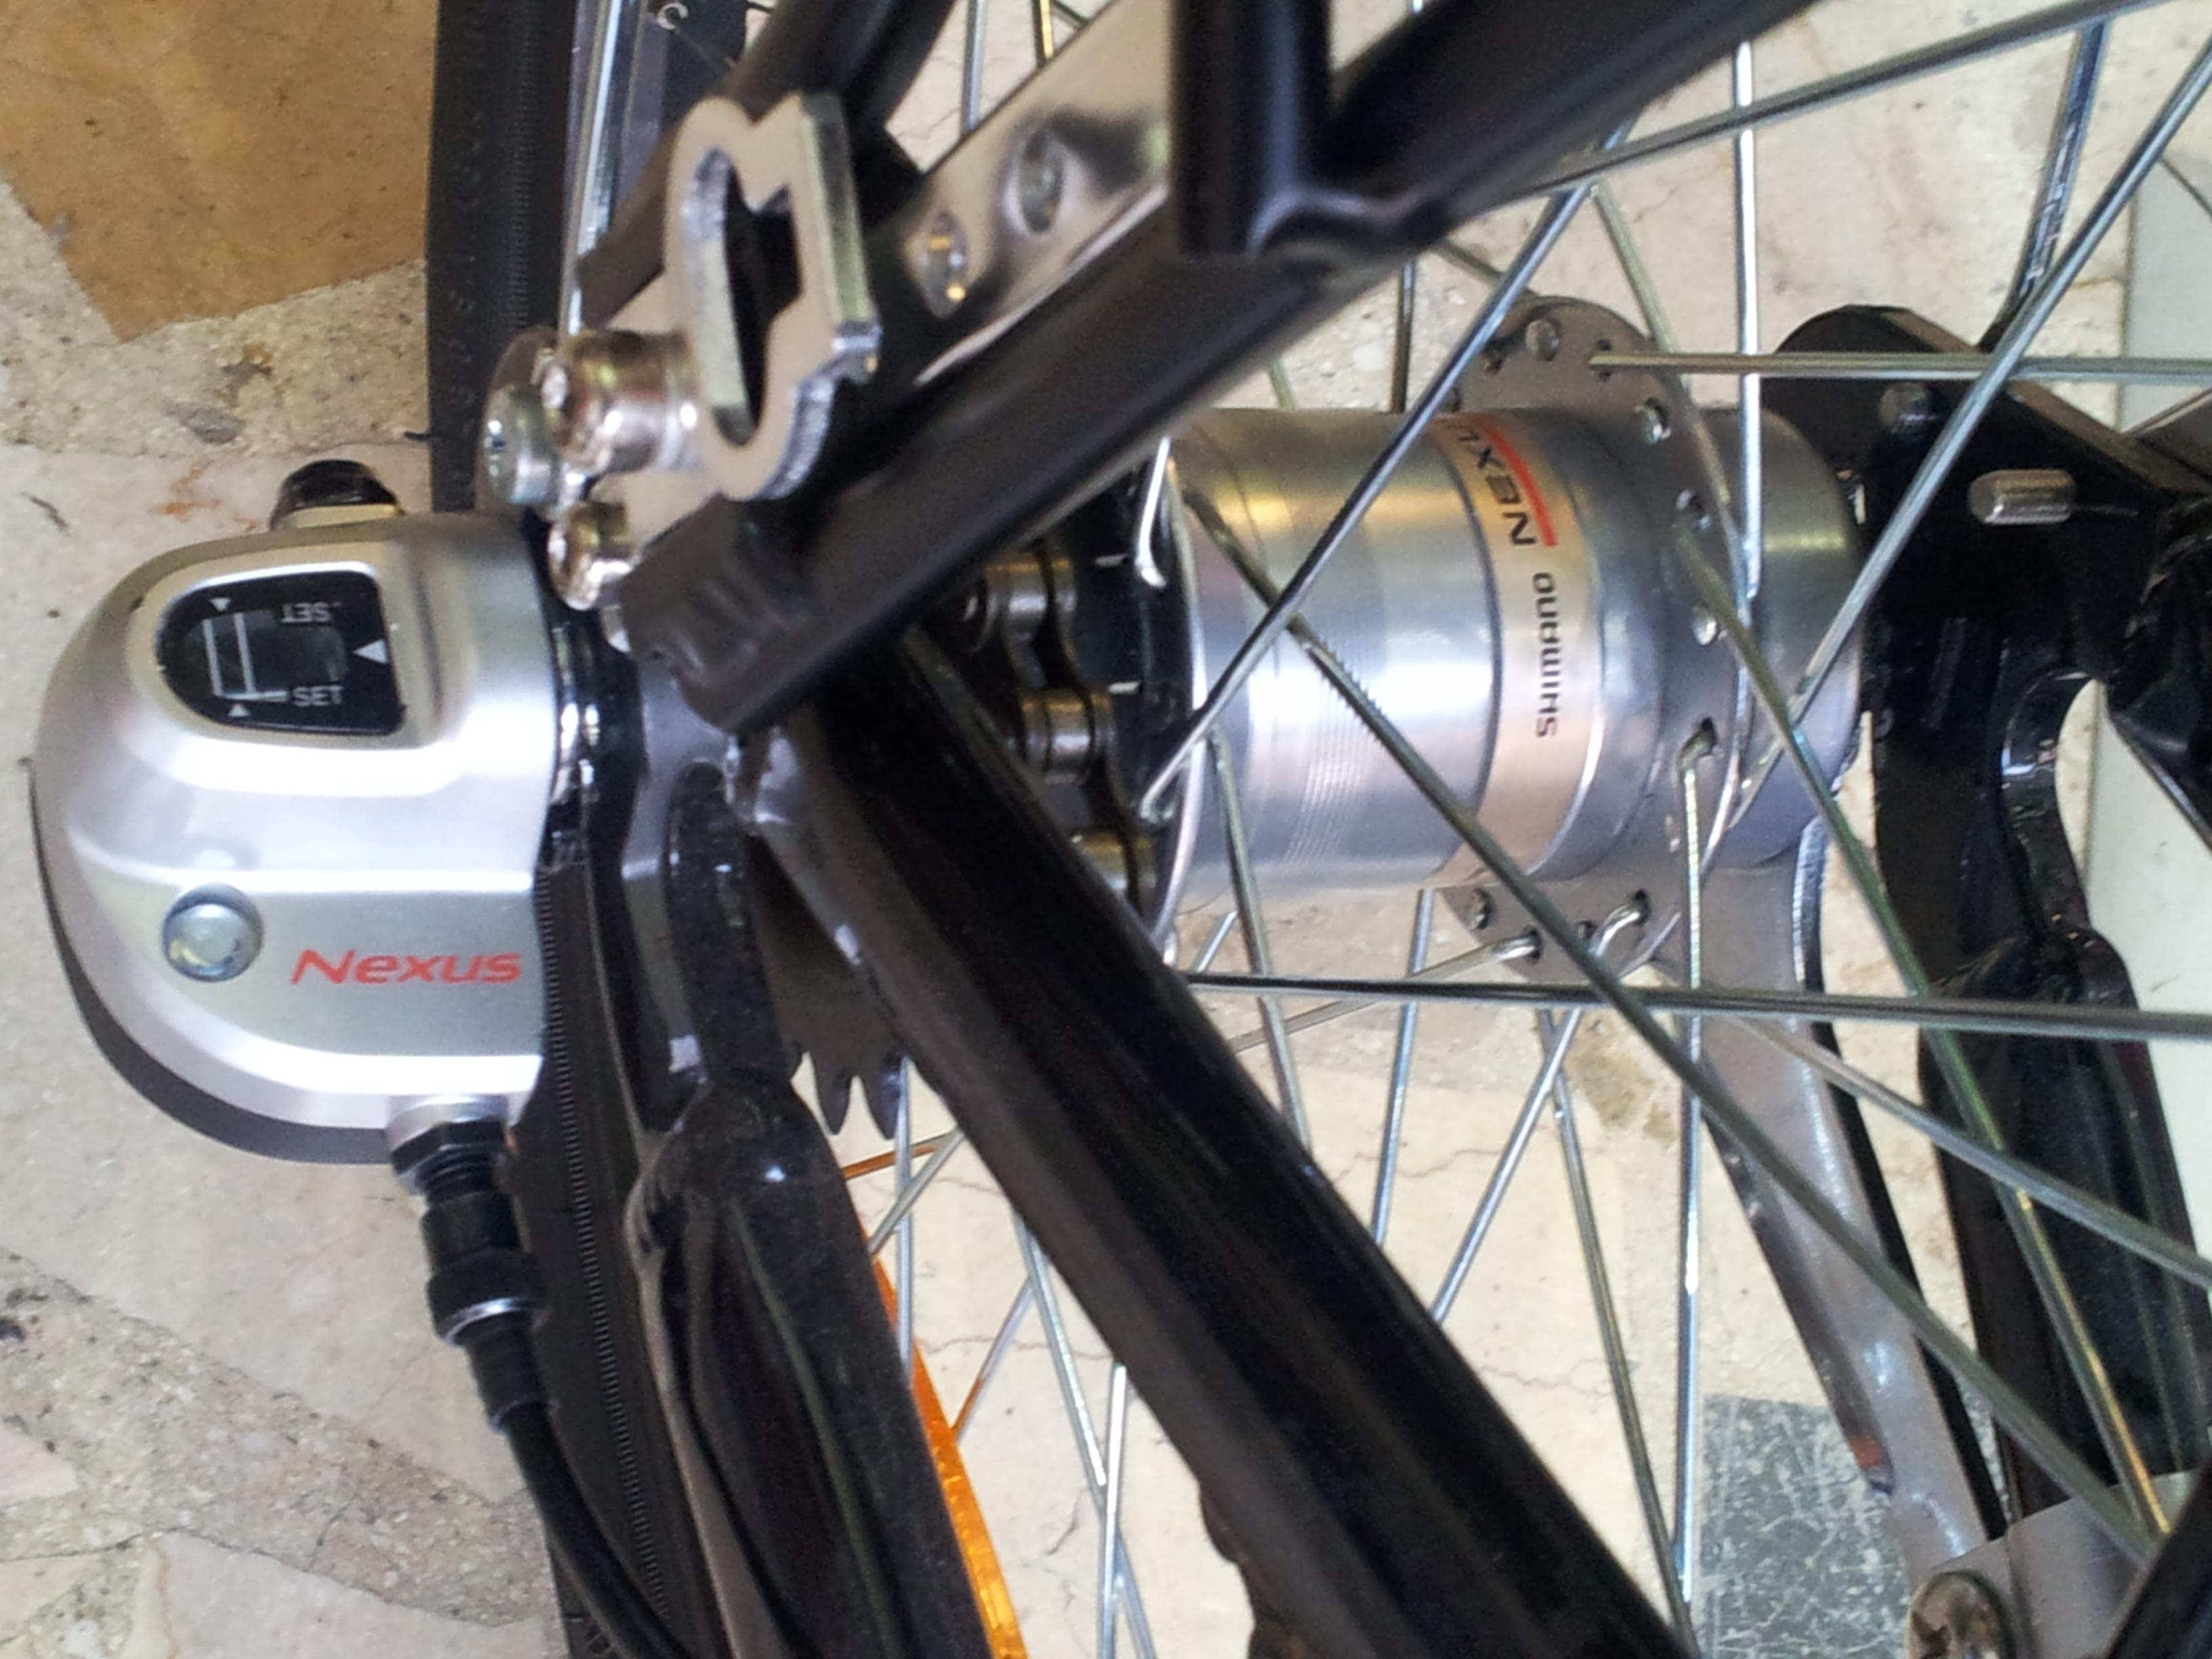 Cambio 3V + freno pedale by CicloLAB